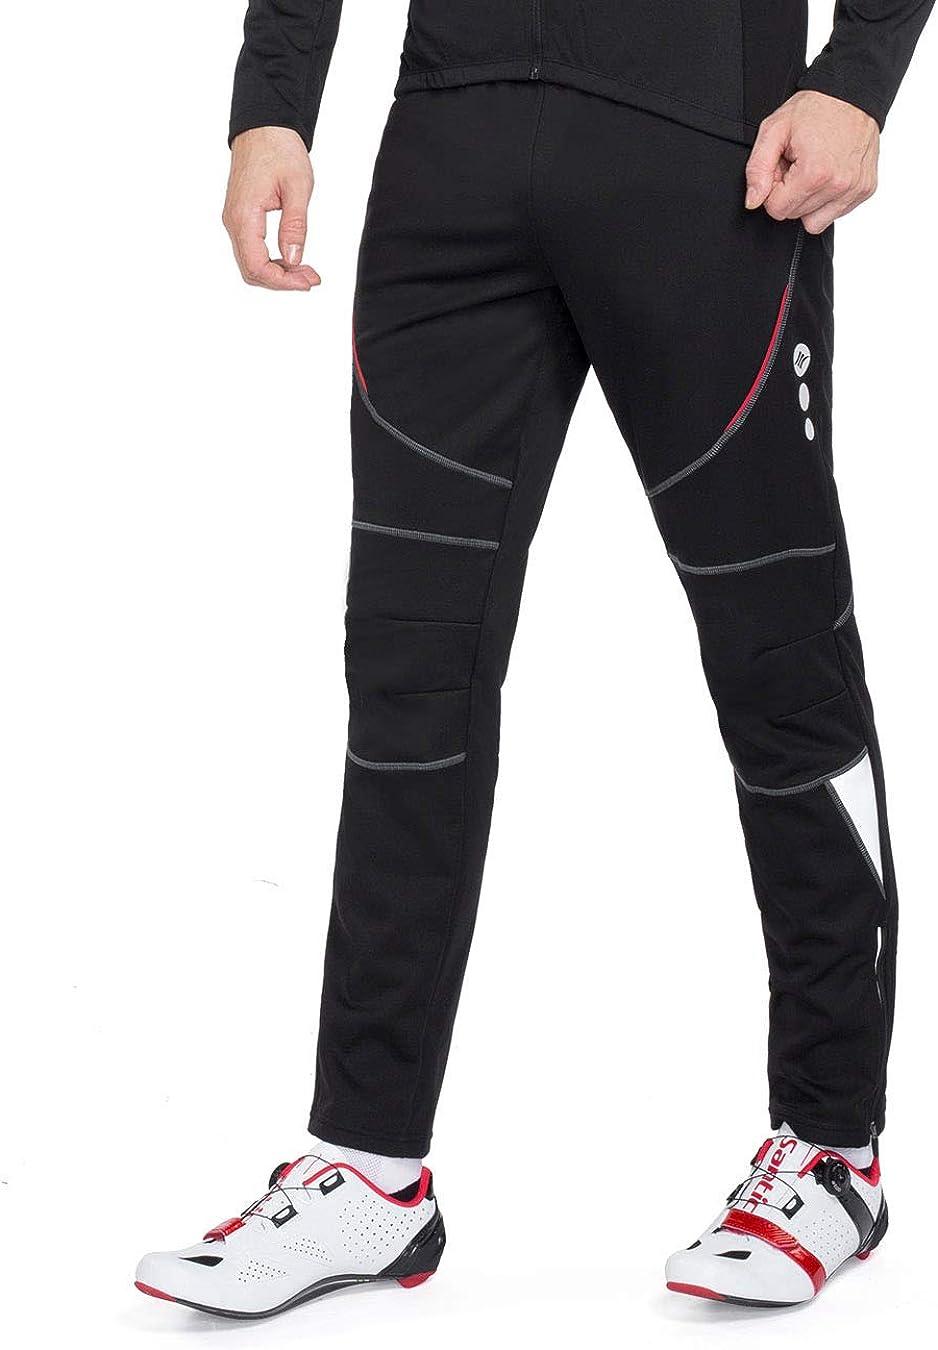 Santic Mens Fleece Thermal Cycling Pants